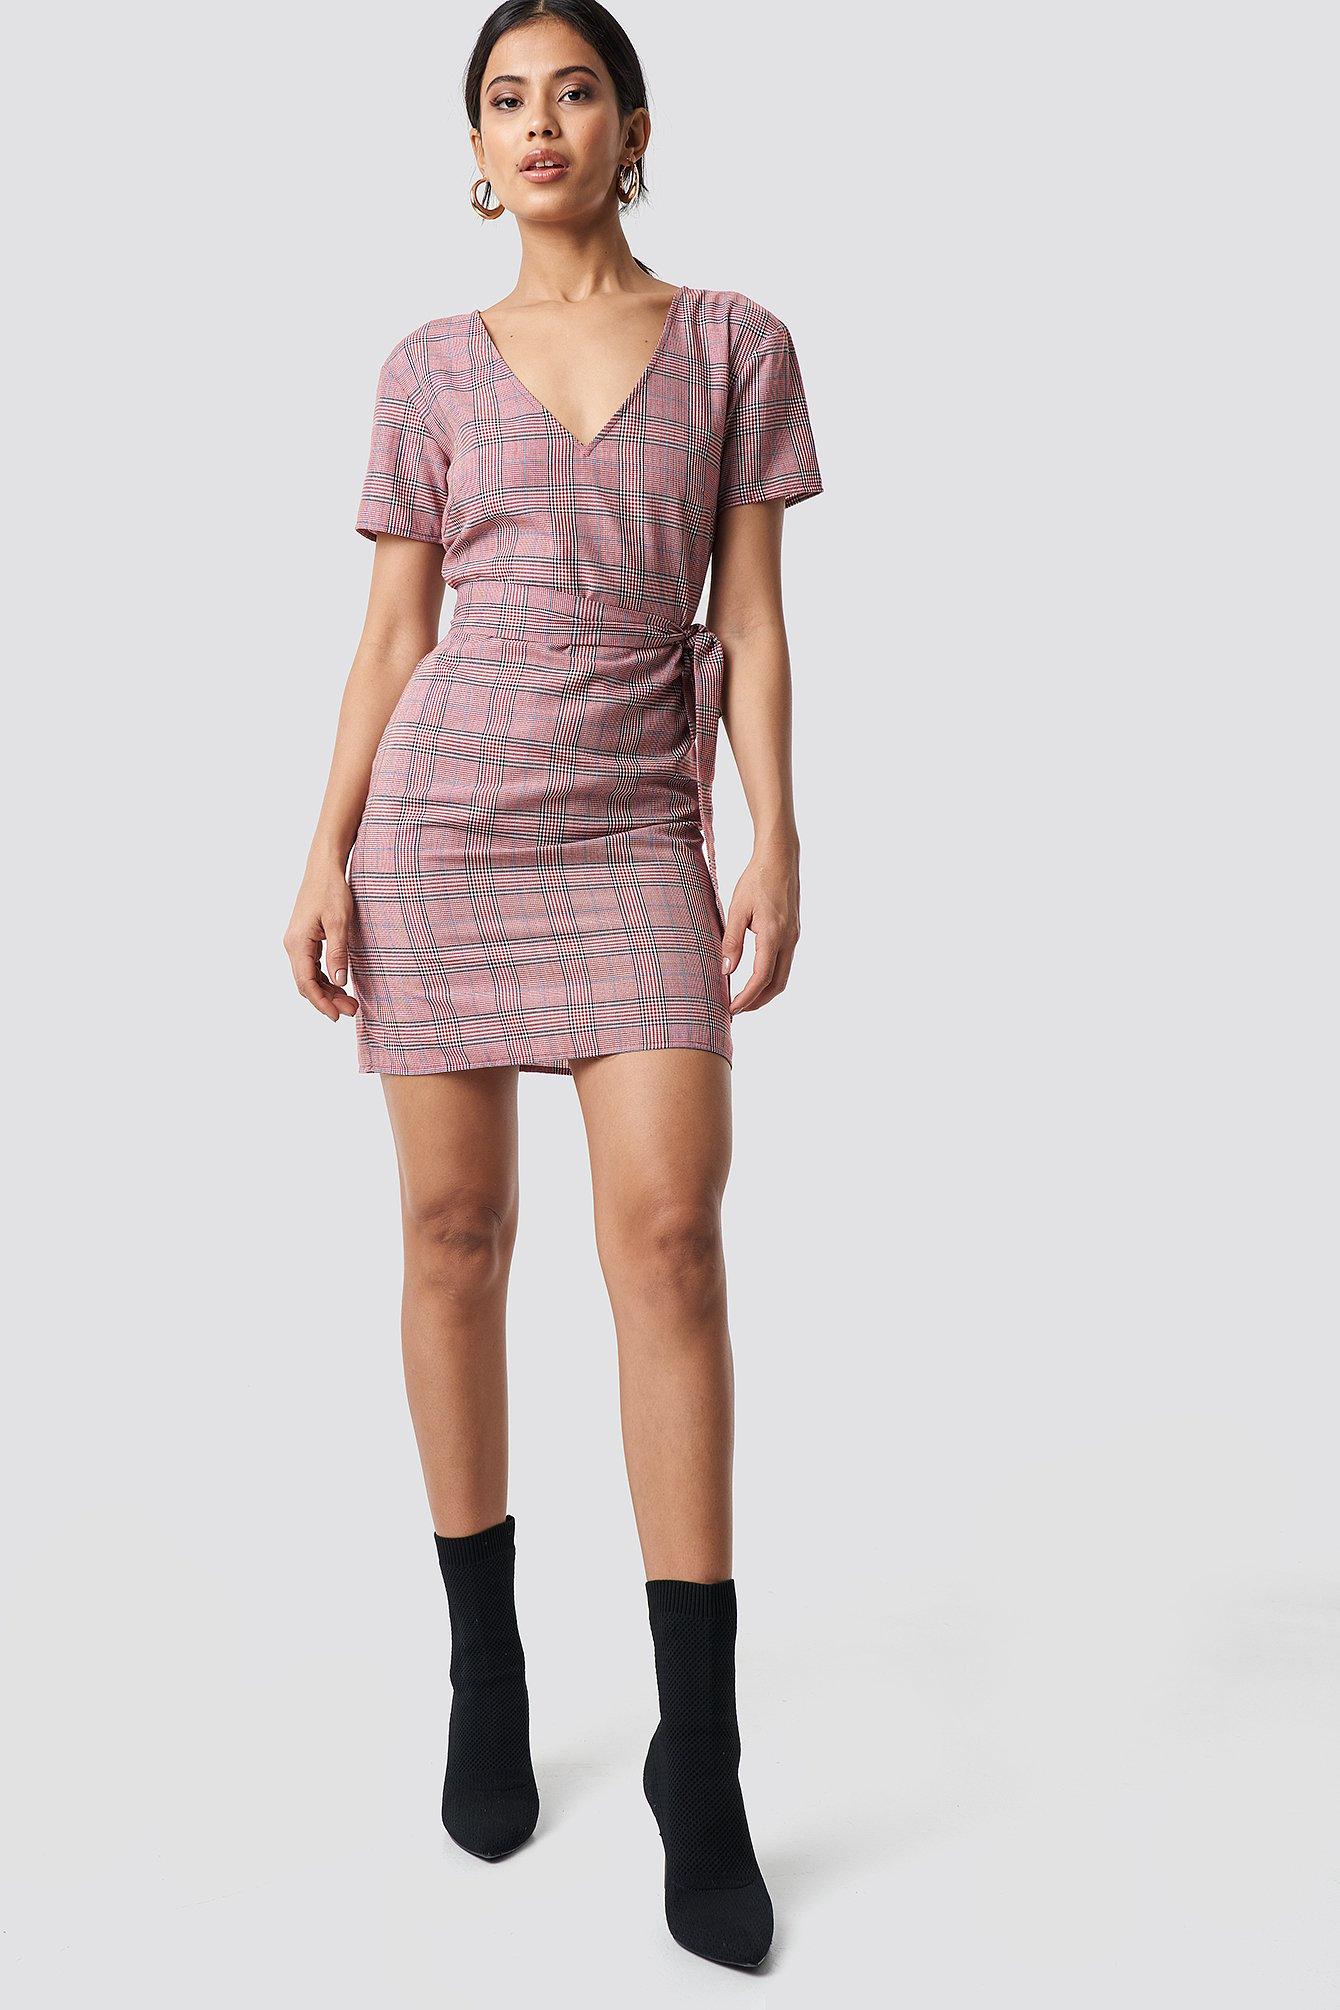 Knot Detail Checkered Dress NA-KD.COM